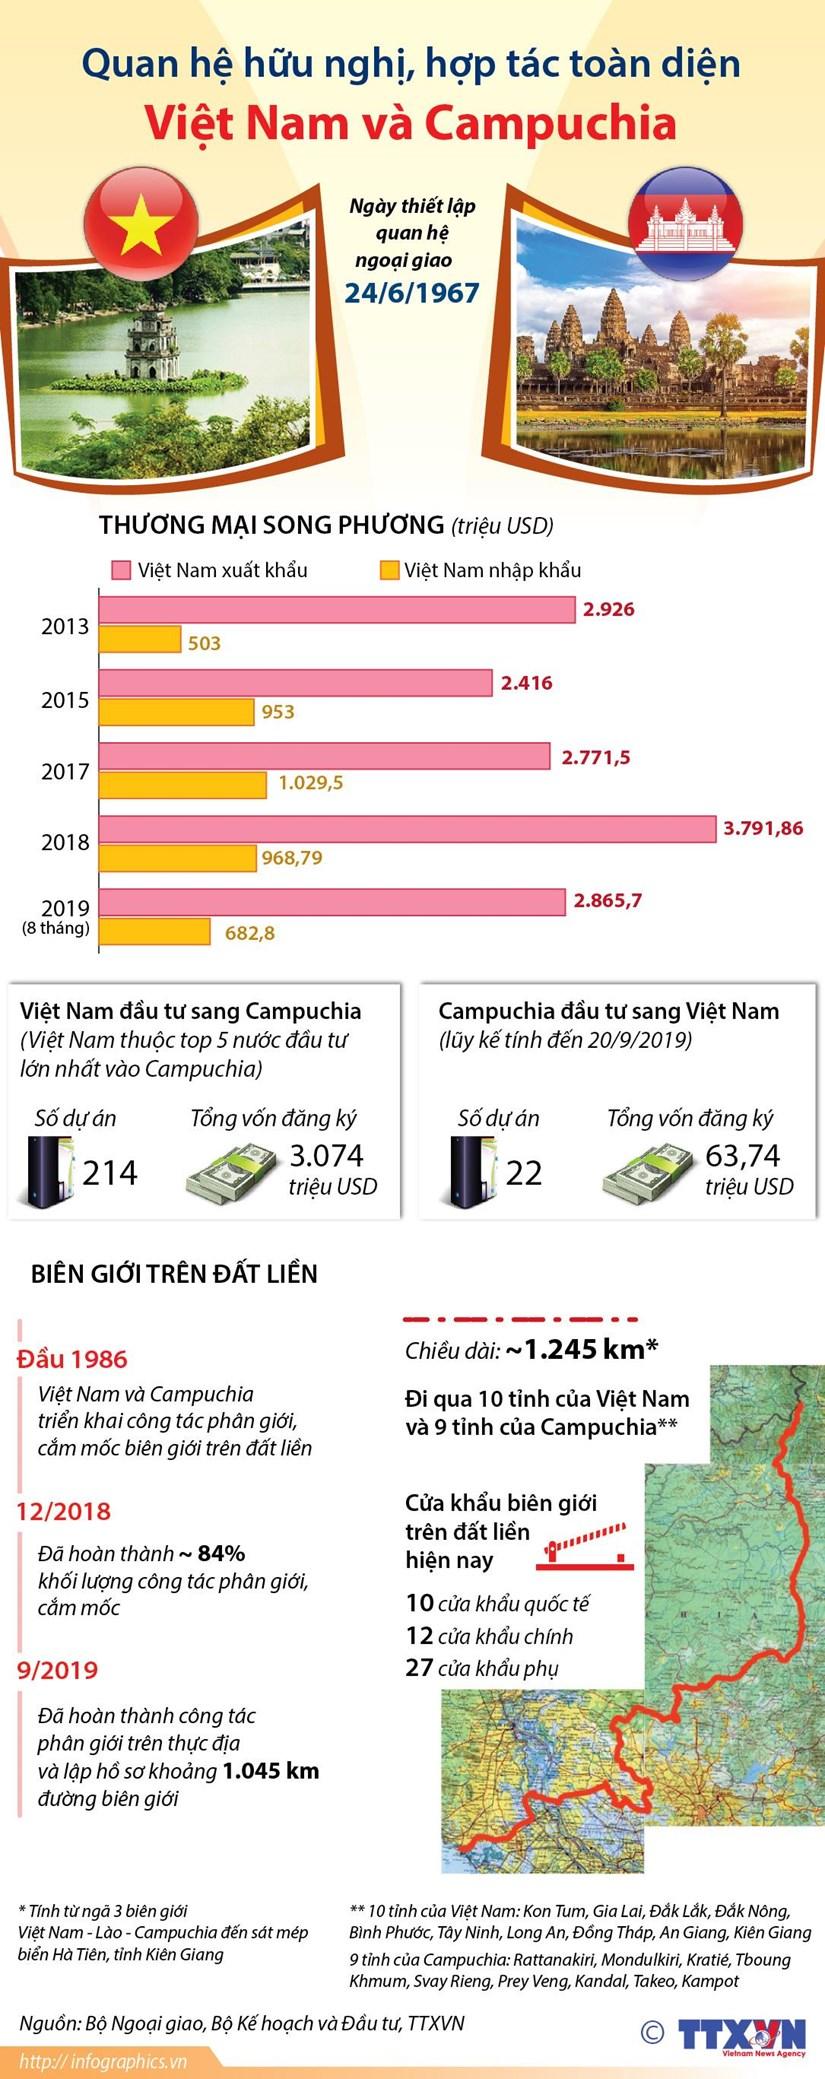 [Infographics] Quan he huu nghi, hop tac toan dien Viet Nam-Campuchia hinh anh 1